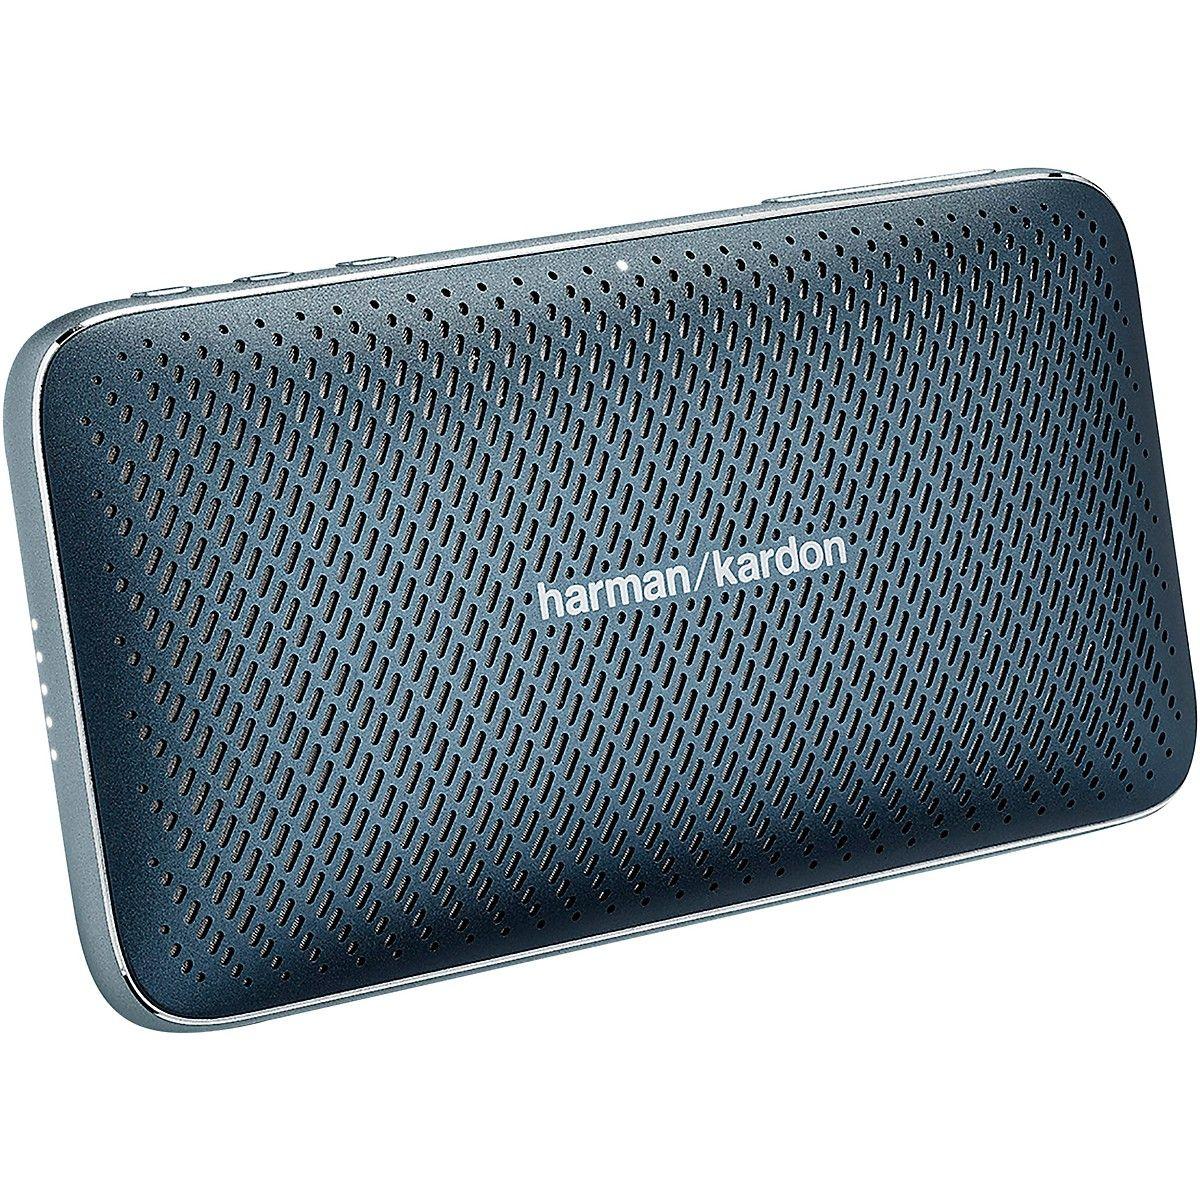 Harman kardon esquire 2 ultra slim portable bluetooth